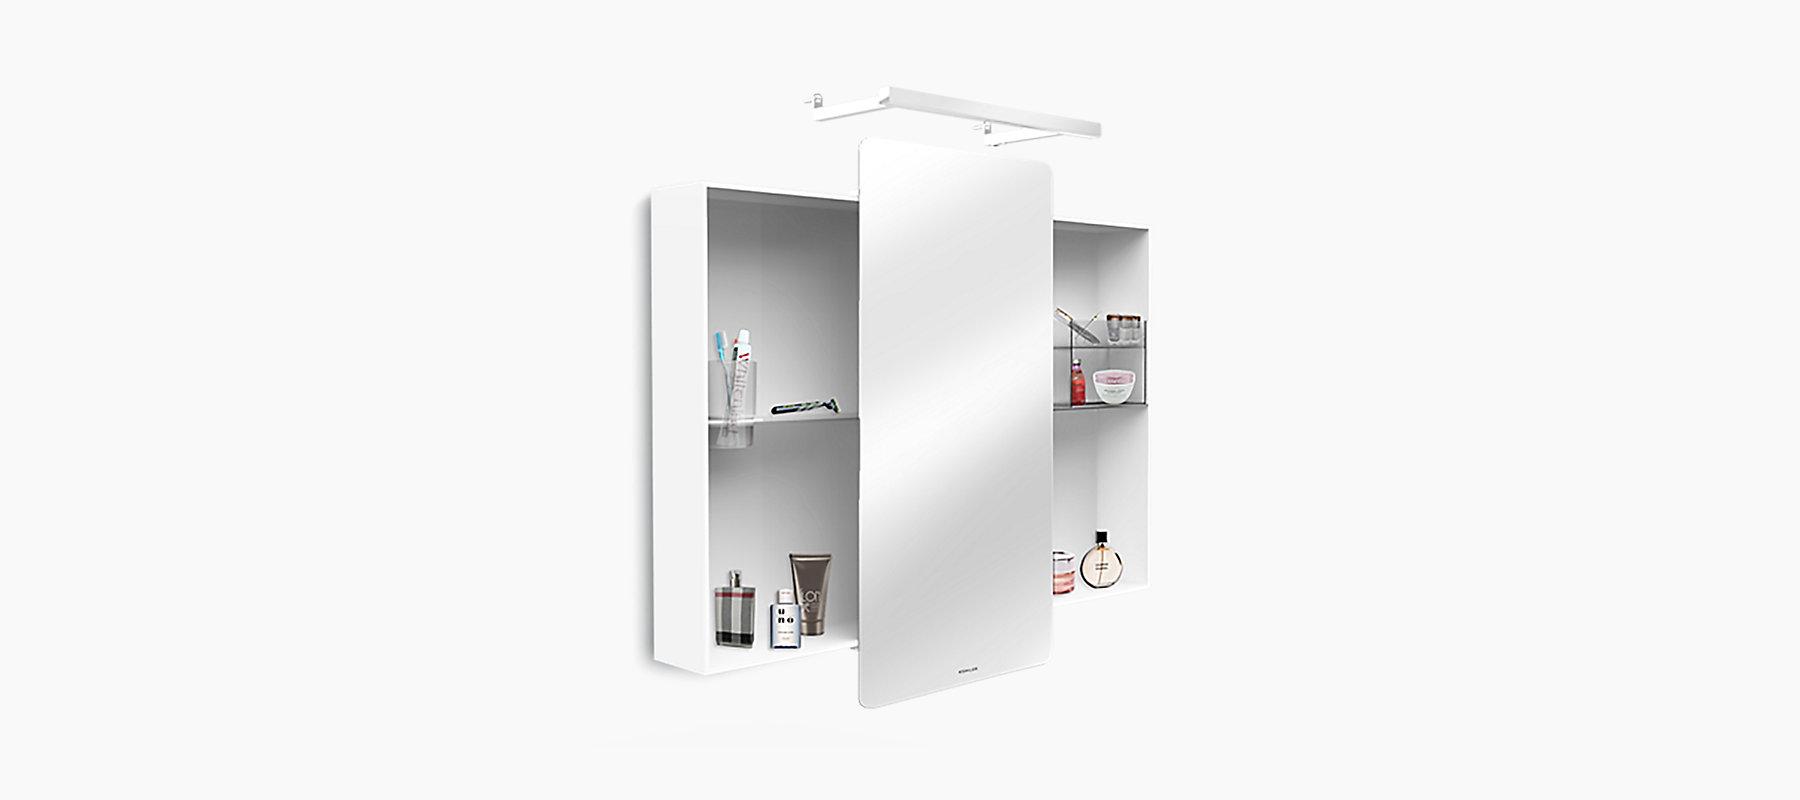 Kohler Malaysia Luxury Bathrooms And Designer Kitchens